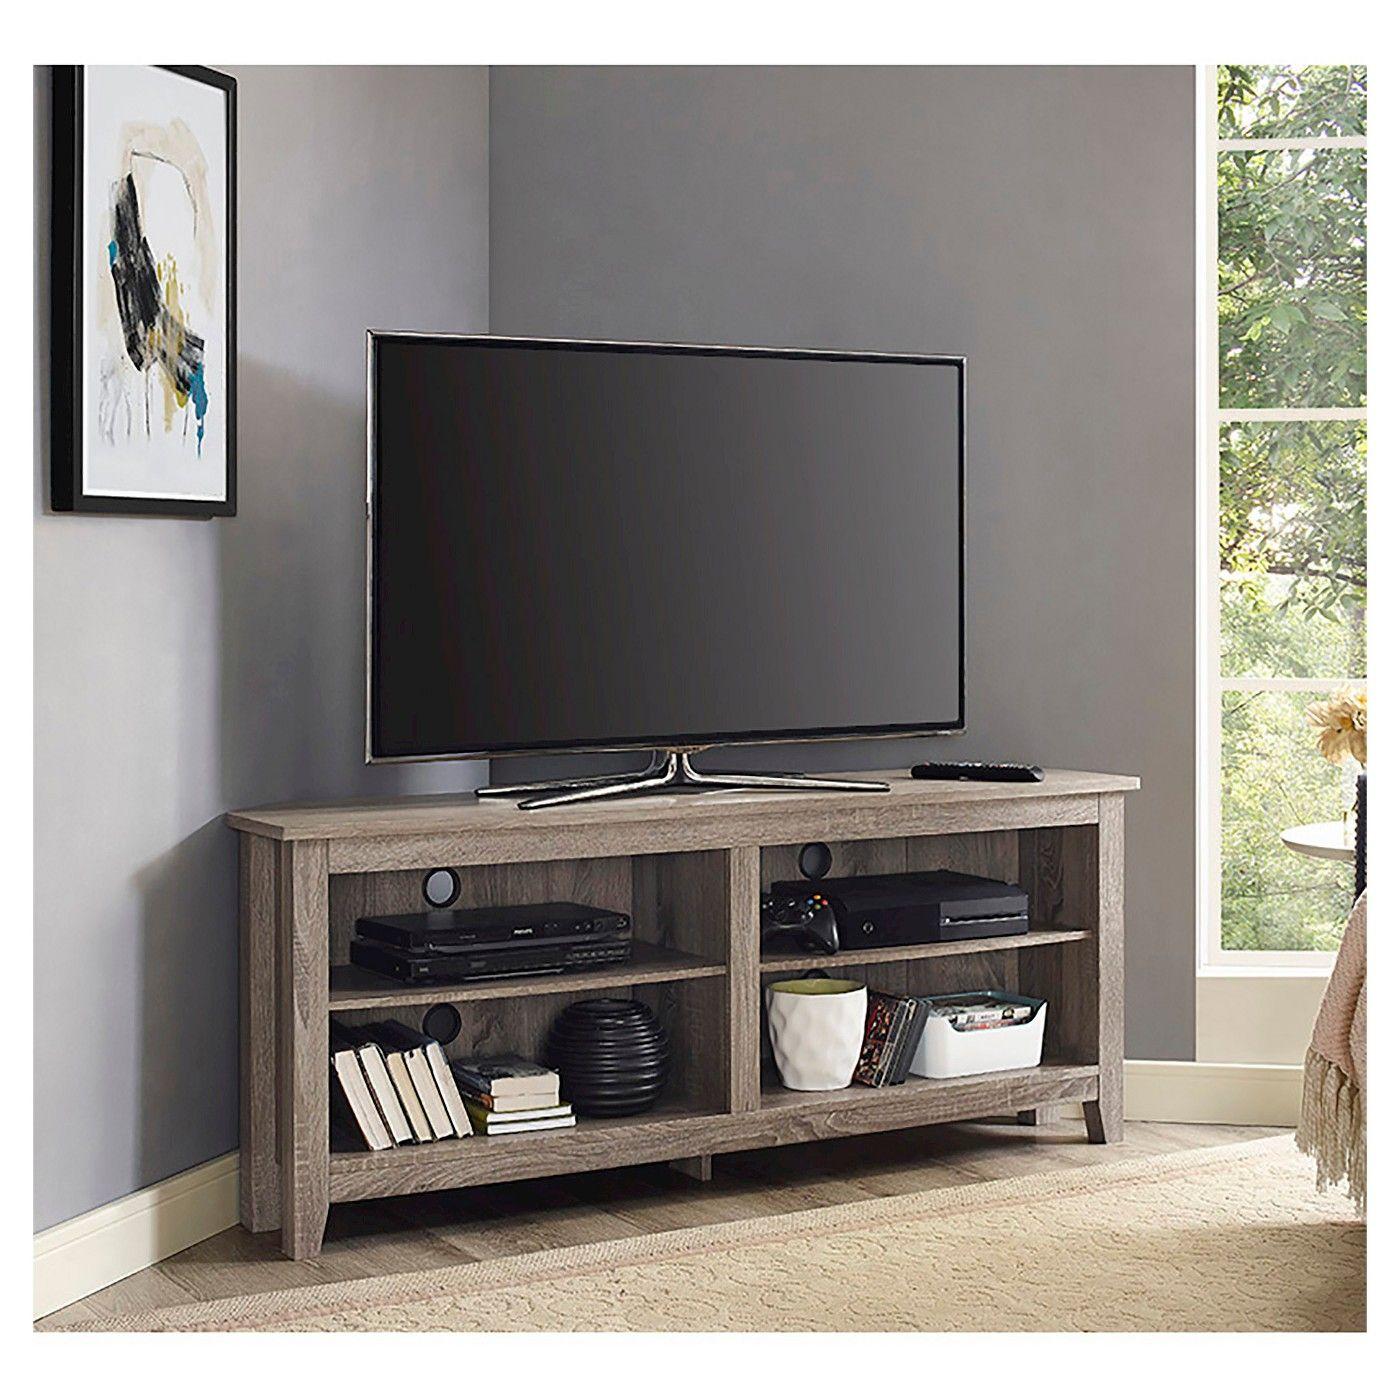 Simple Open Storage Shelf Corner Tv Stand For Tvs Up To 65 Driftwood Saracina Home Corner Tv Stands Wood Corner Tv Stand Corner Tv Stand